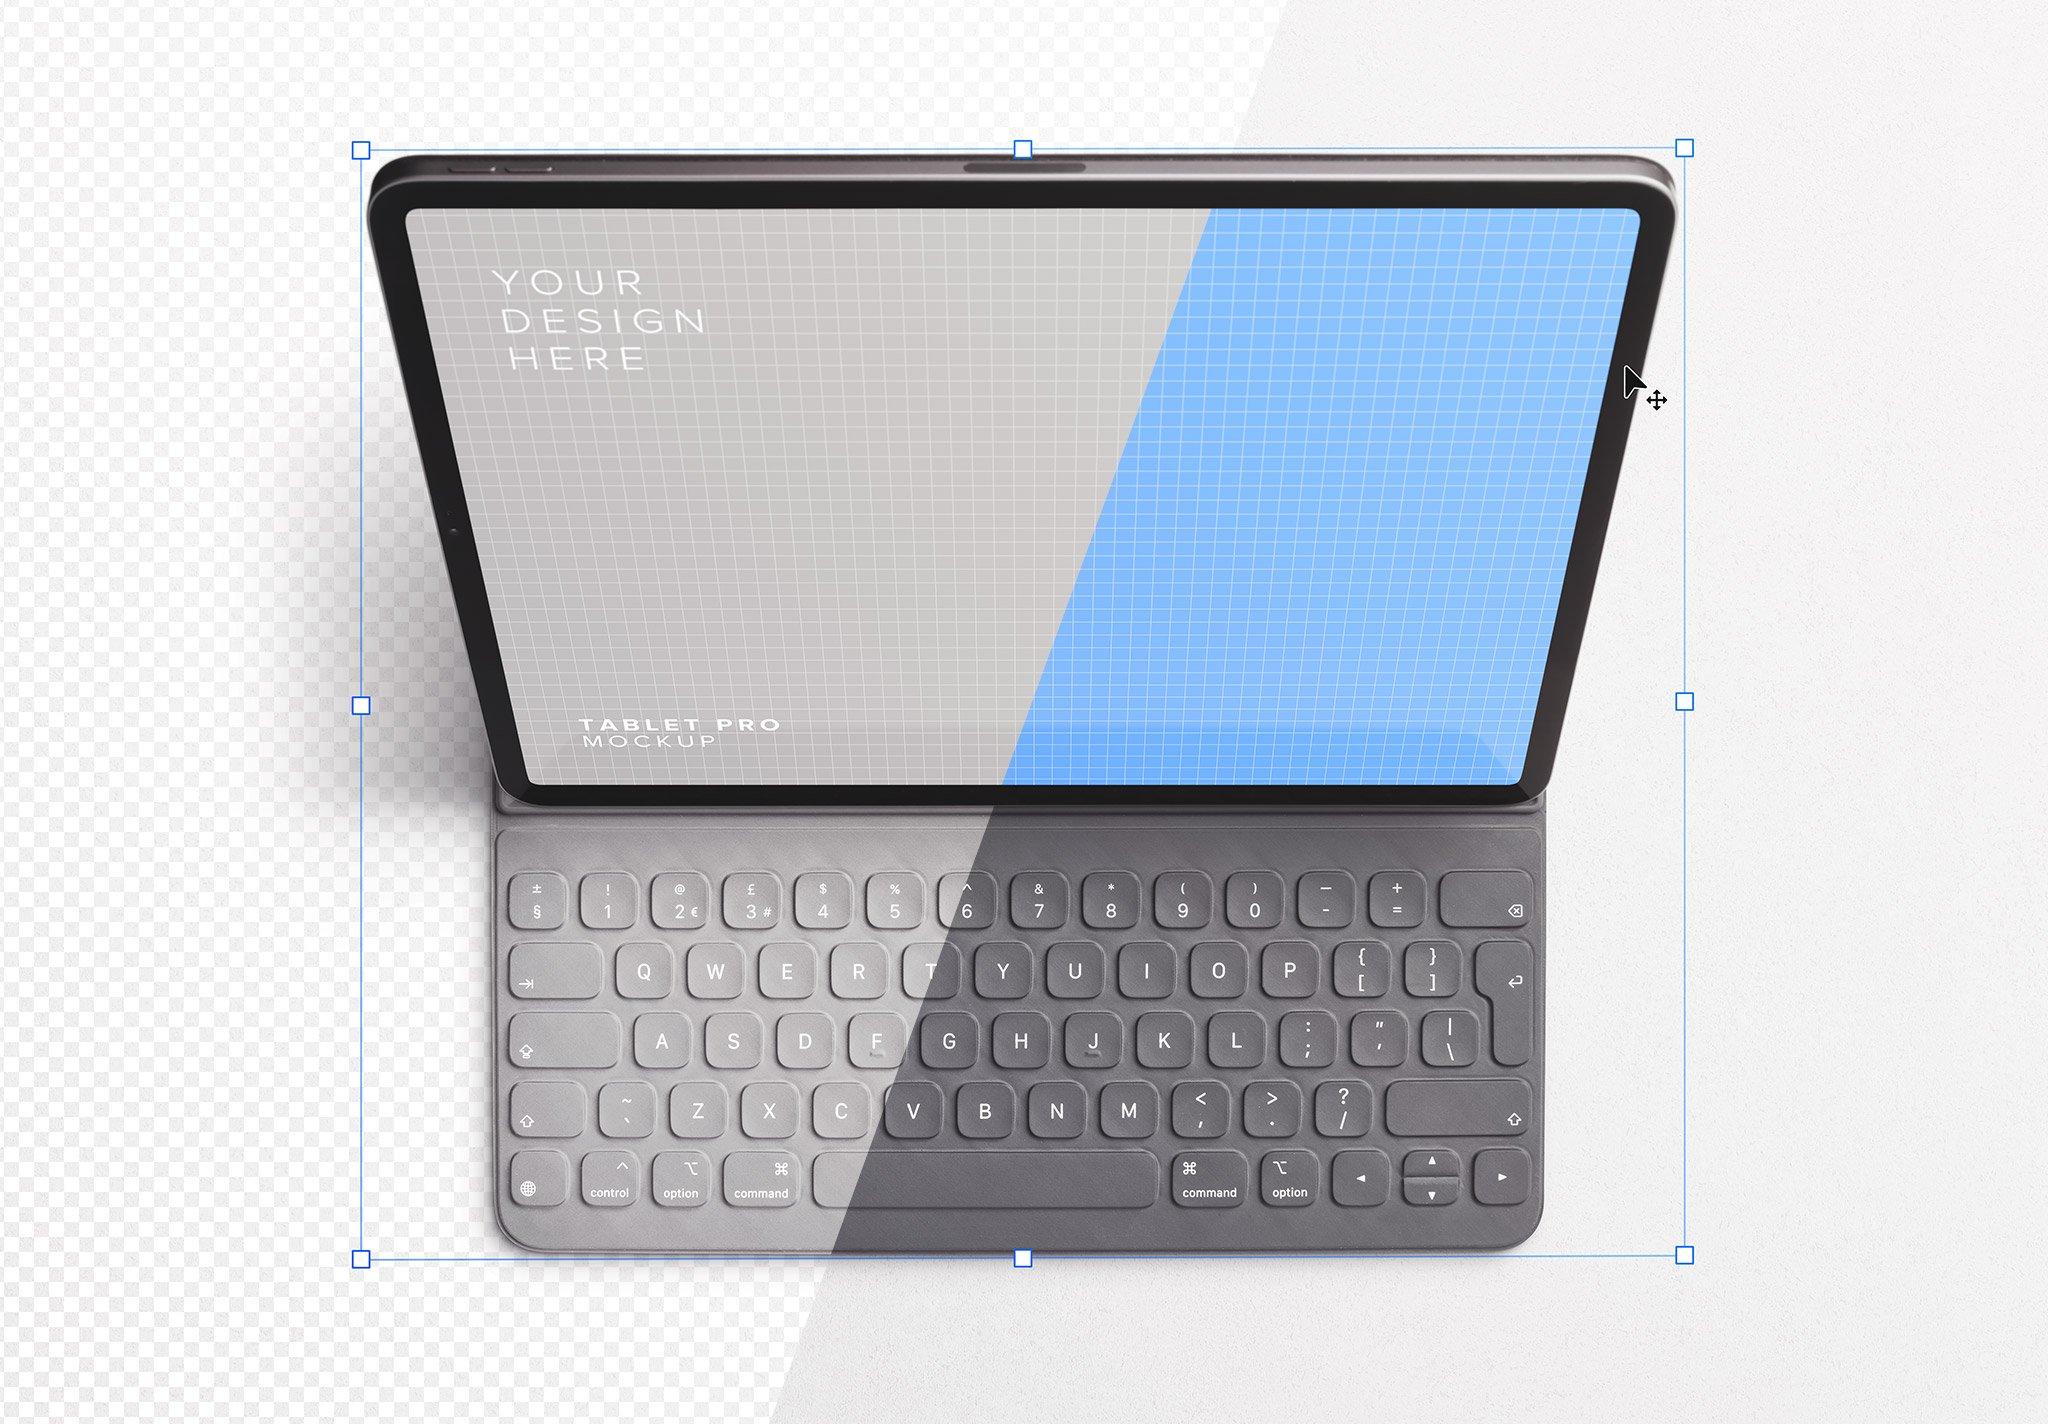 tablet pro mockup w keyboard image01